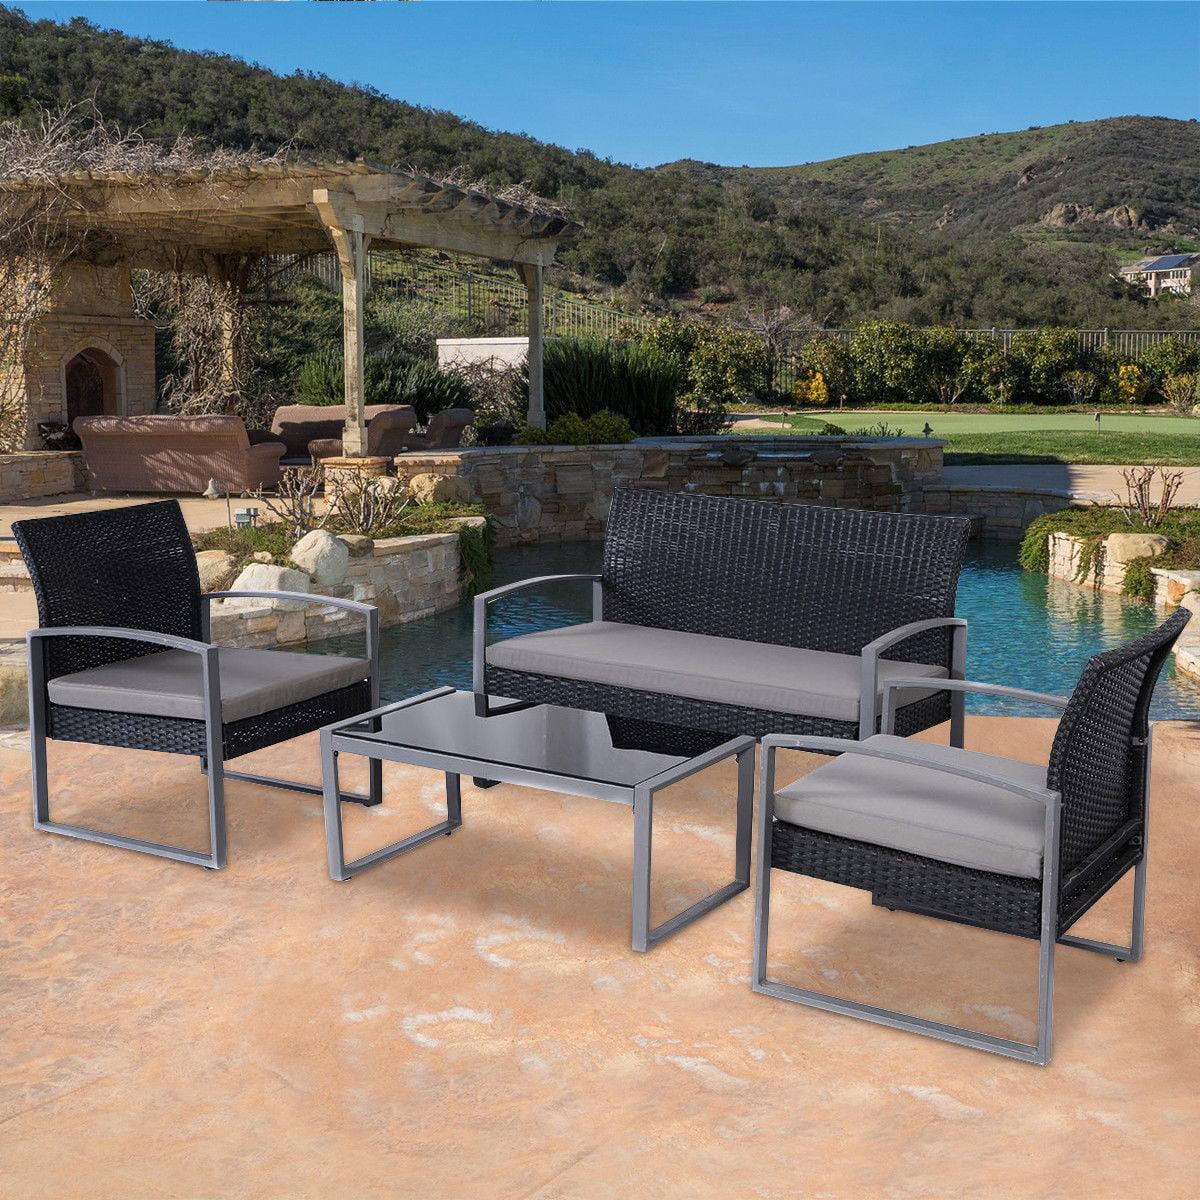 Costway 4 PCS Outdoor Patio Garden Black Rattan Wicker Sofa Set Furniture Cushioned by Costway